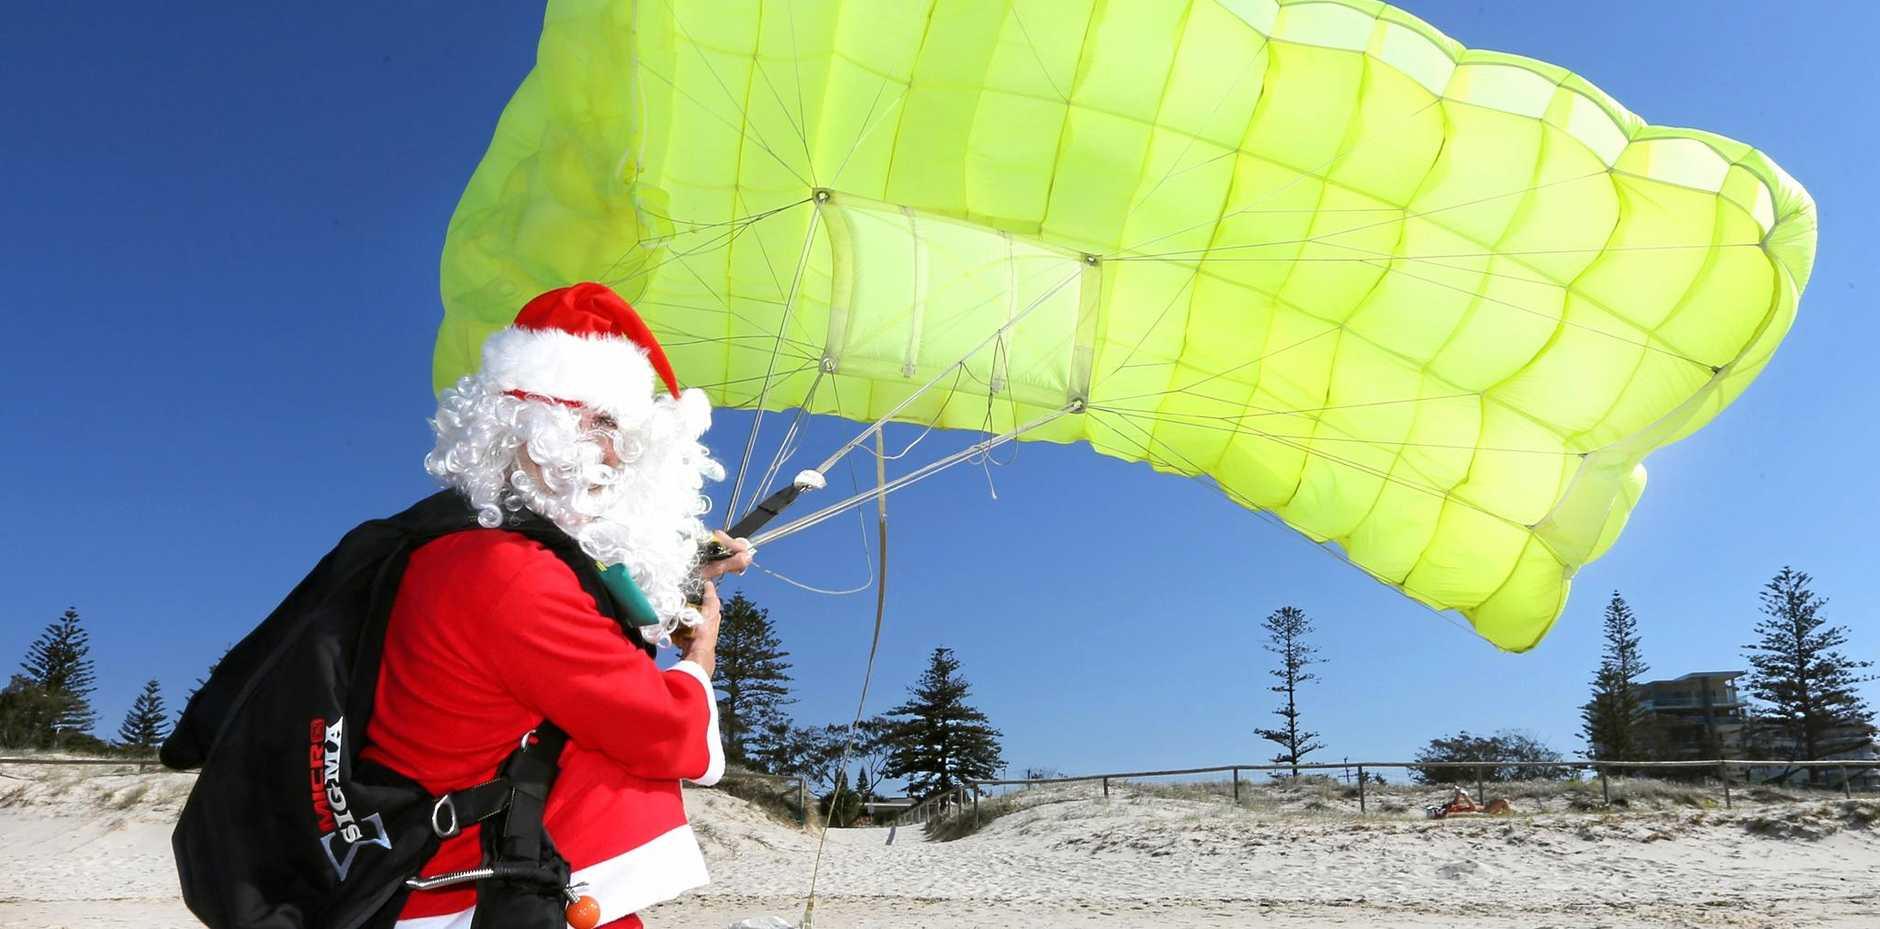 Santa gets ready to skydive into the Coolangatta Christmas Carols on Sunday, December 13. Photo: Scott Powick Daily News